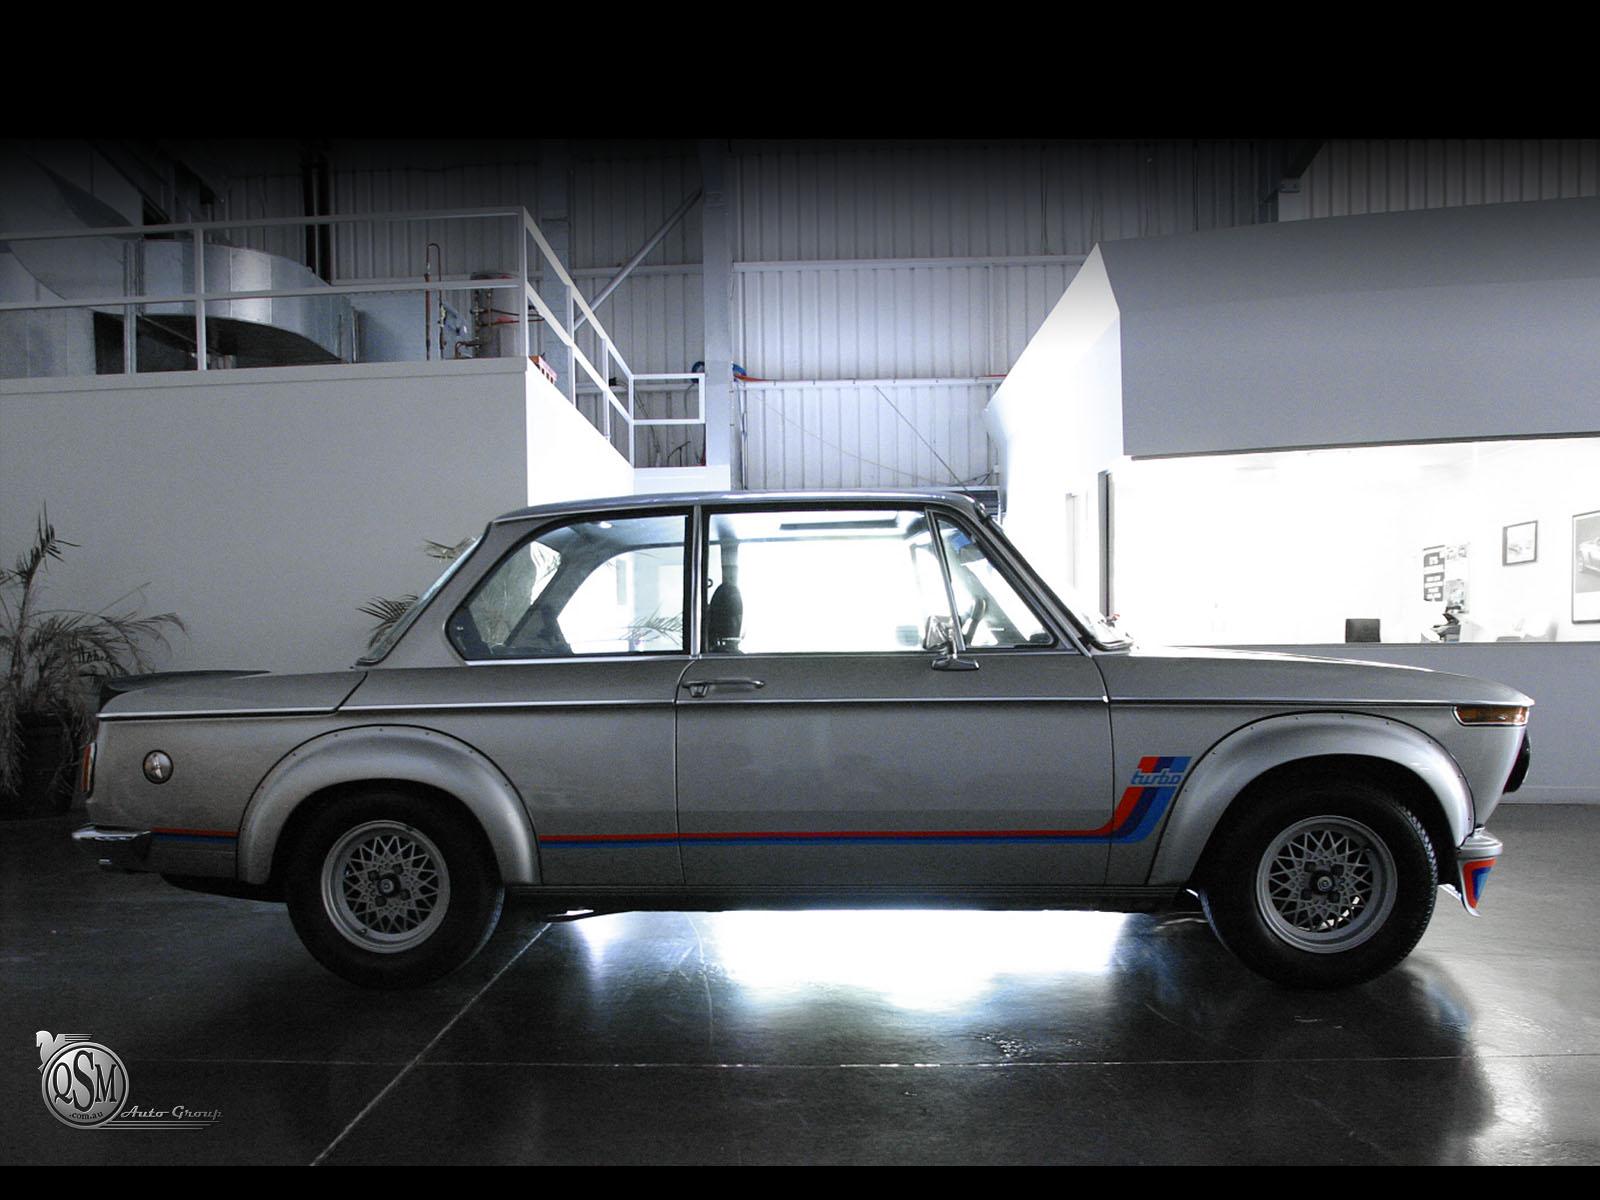 BMW 2002 Turbo [Bandai 1/20] - Forum Modellismo.net